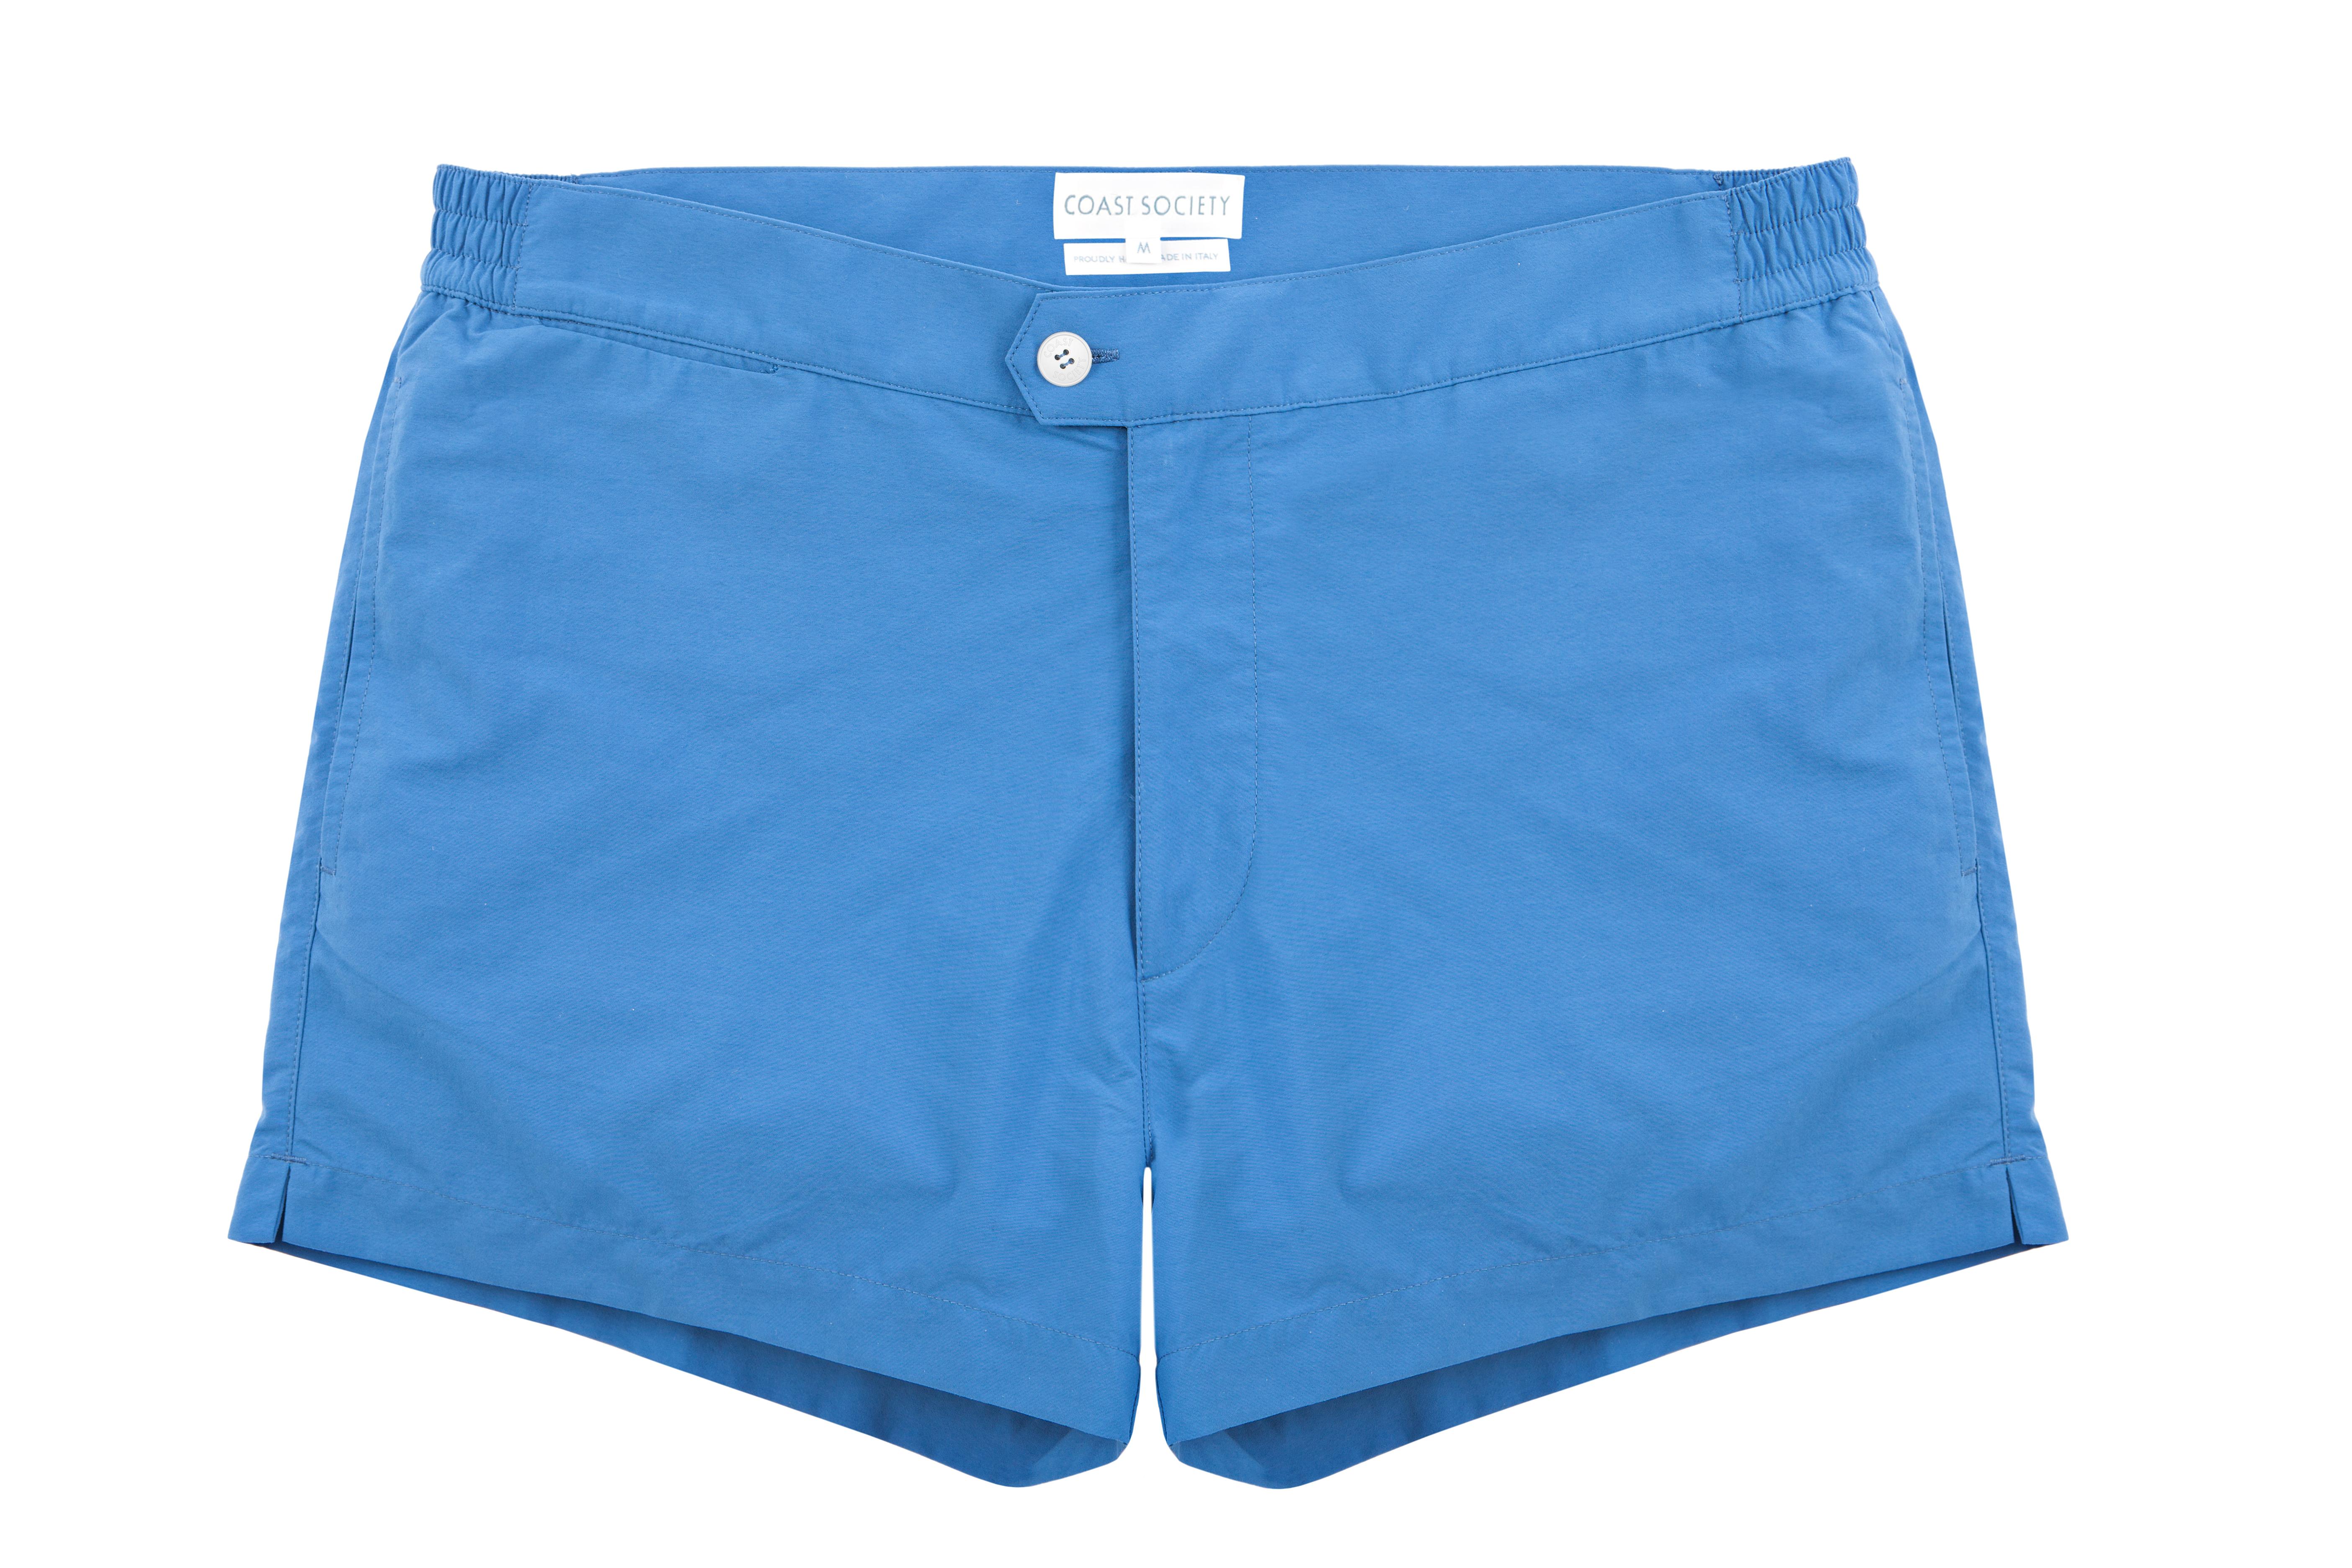 Fulco bleu azur